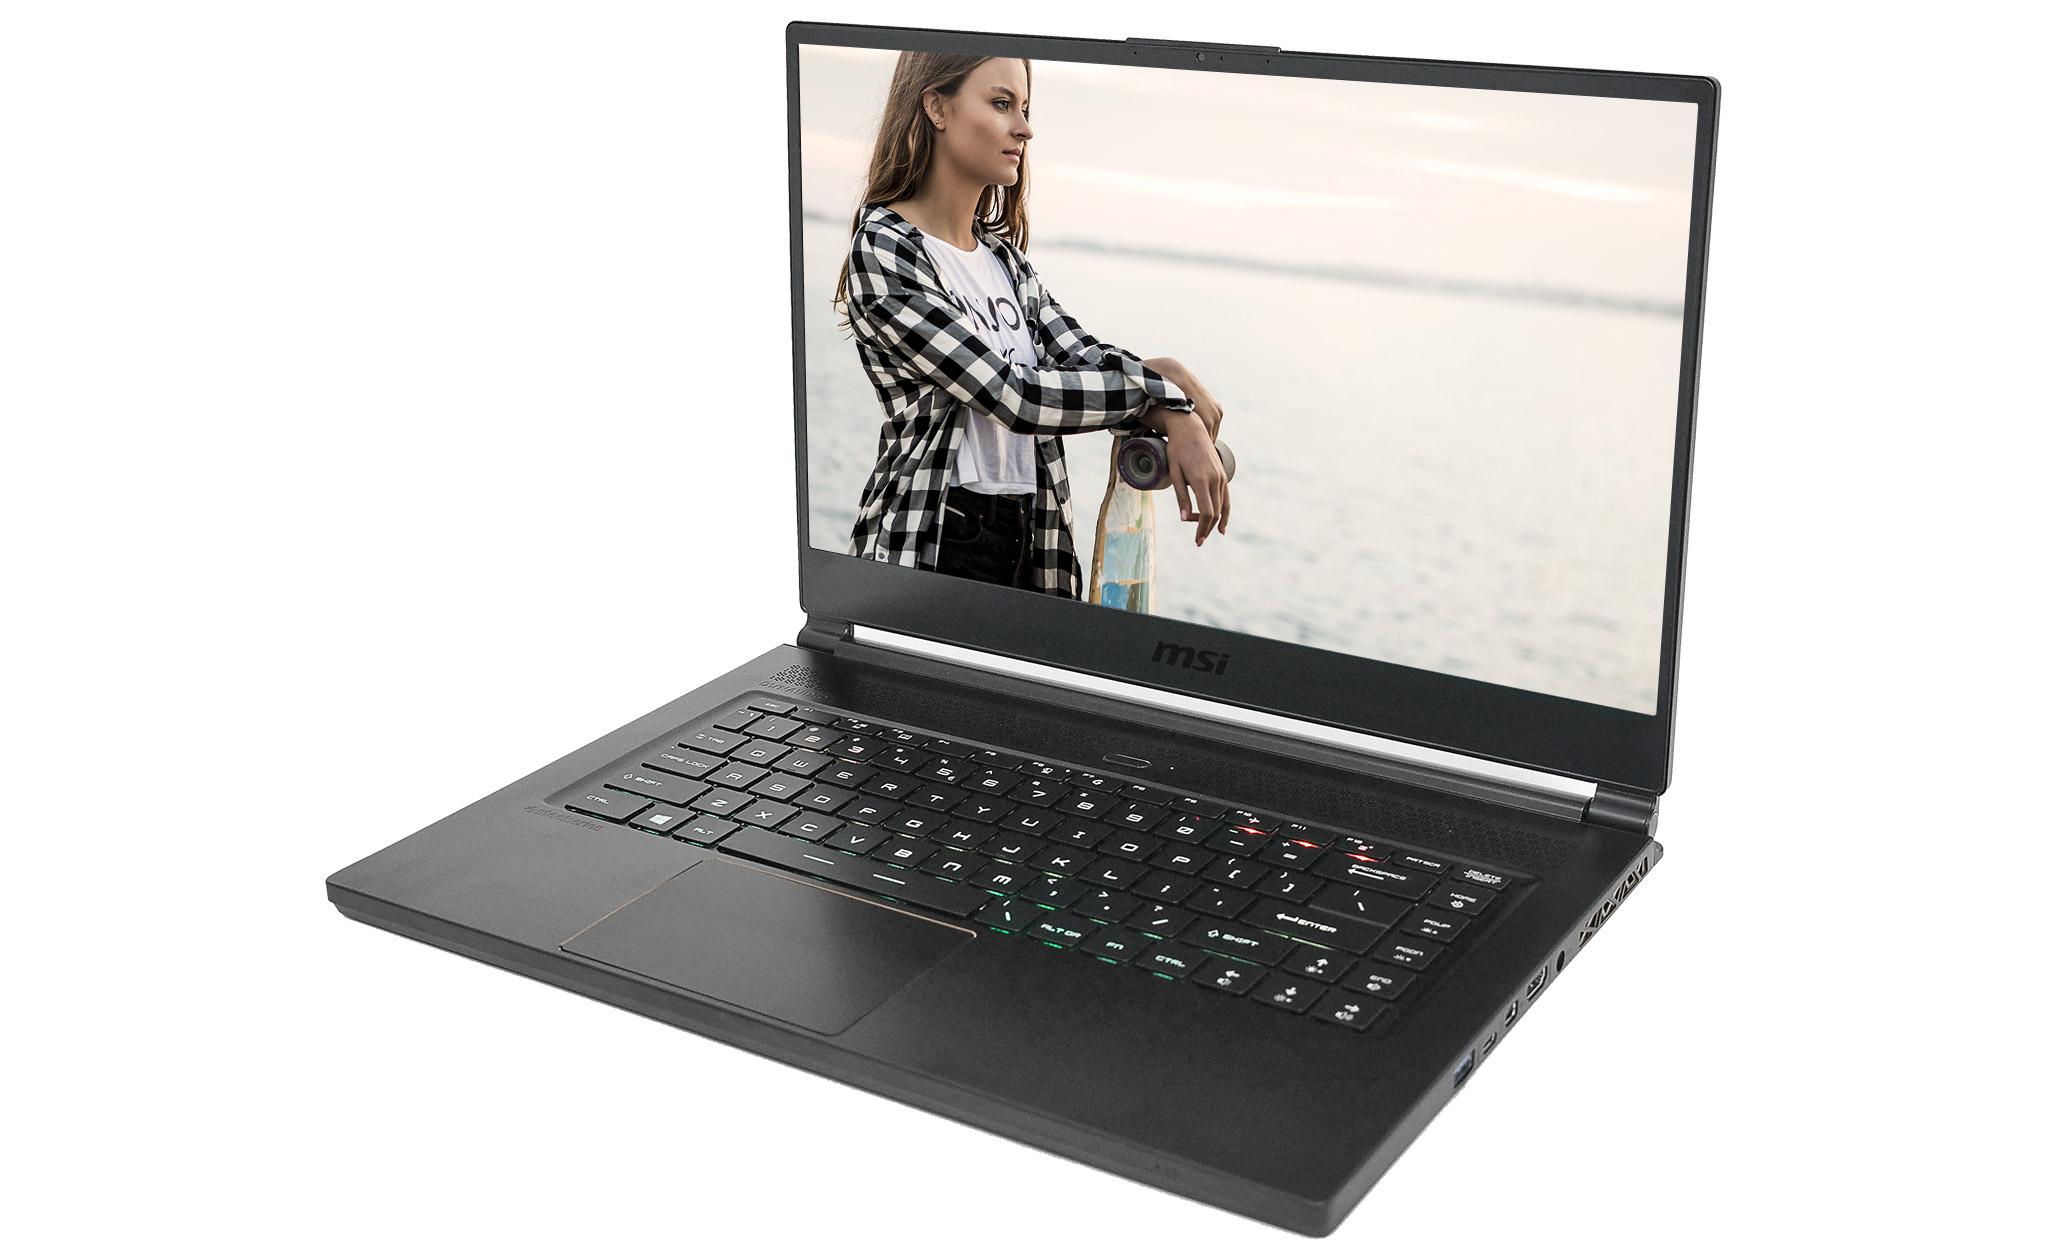 MSI GS65 6 CORE Laptop 2018 Engineering Sample FIRST LOOK!   KitGuru